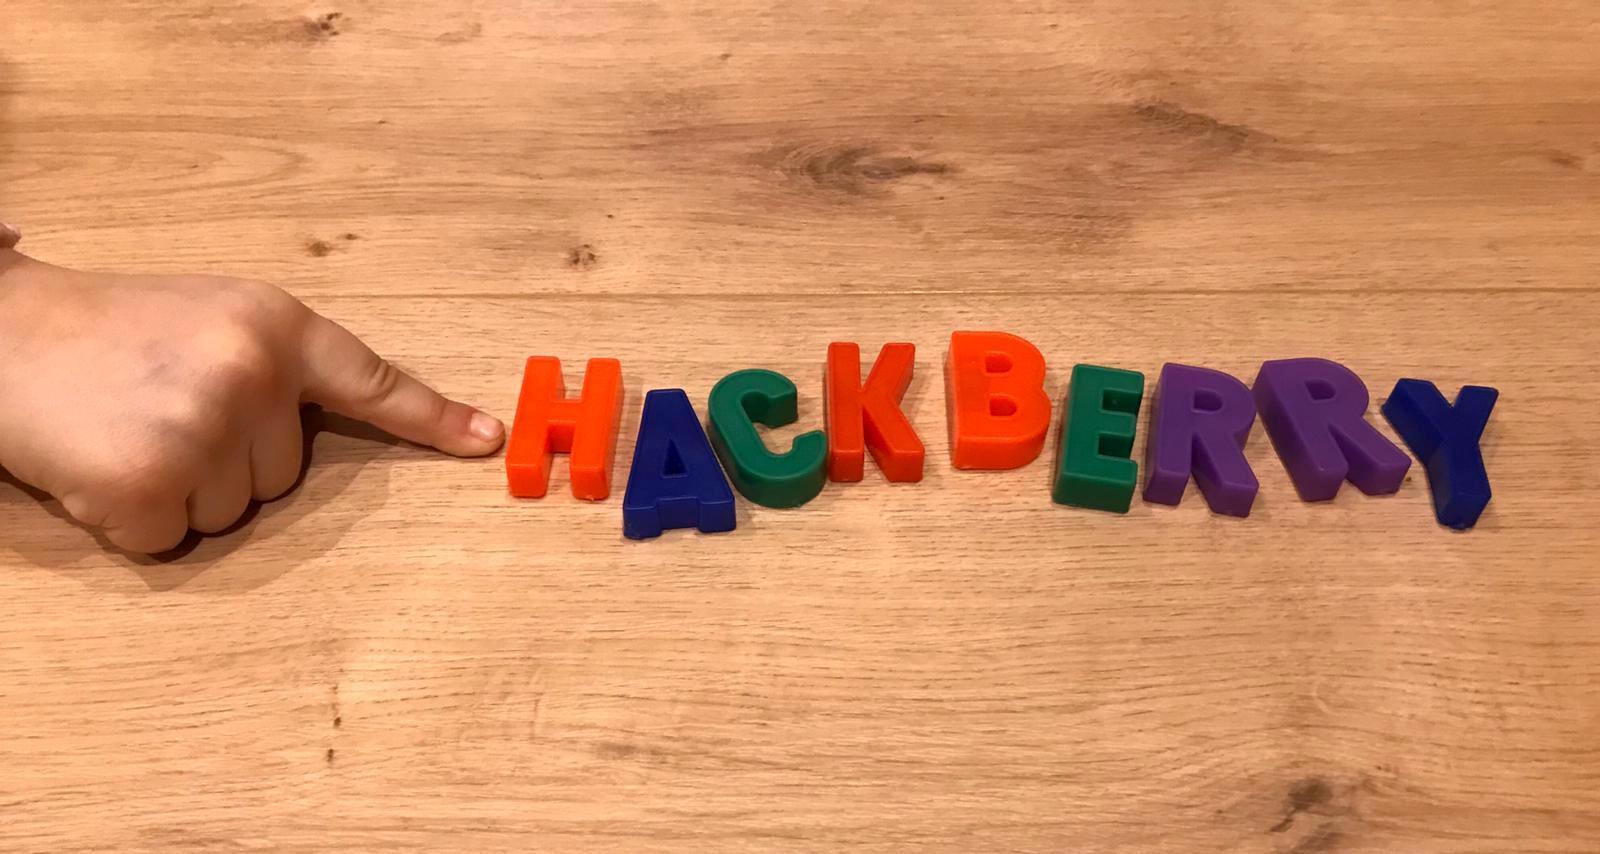 Hackberry Schriftzug Magneto.JPG